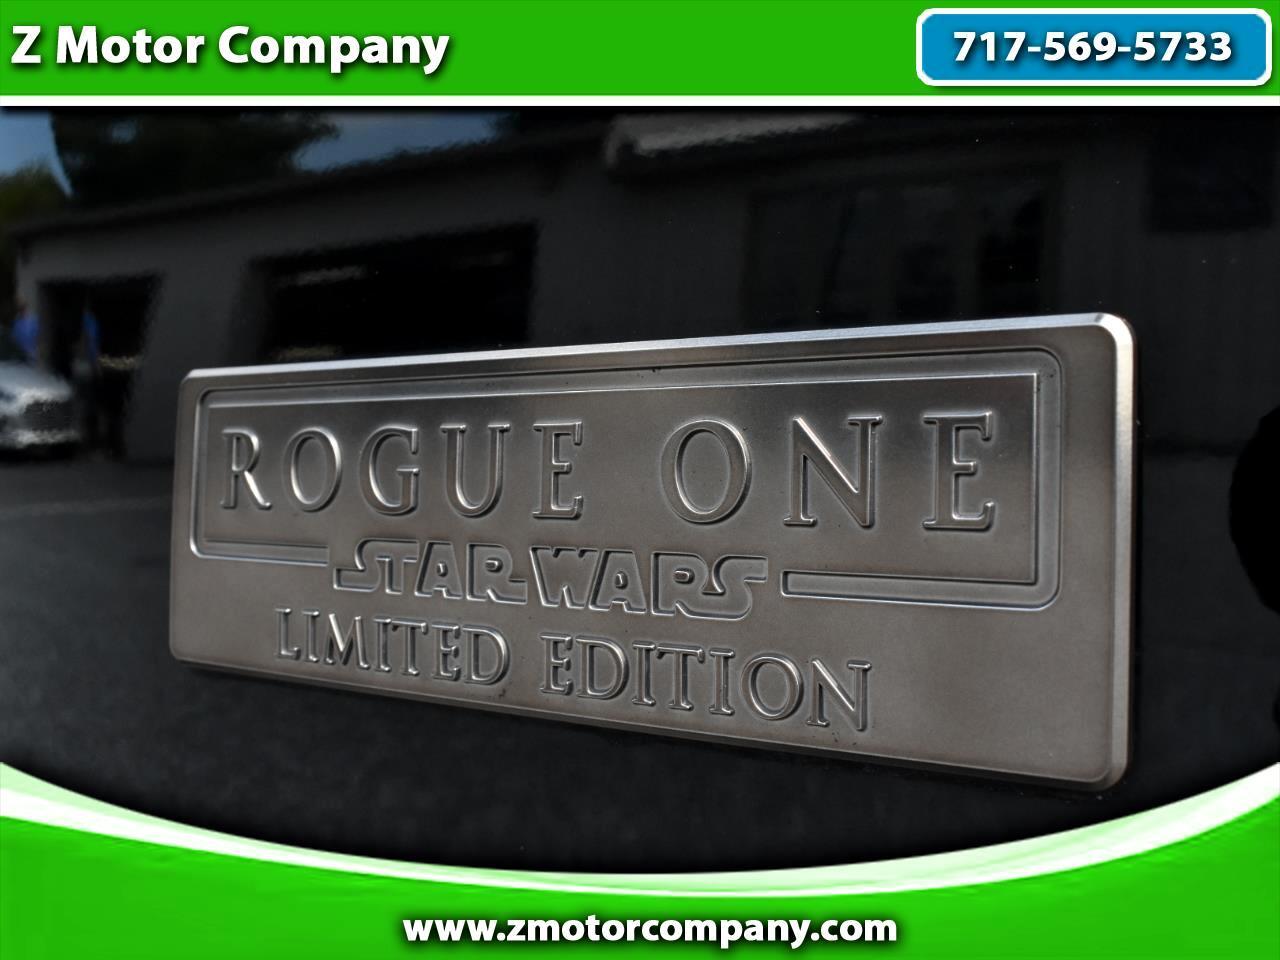 2017 Nissan Rogue SV AWD w / Rogue One Pkg